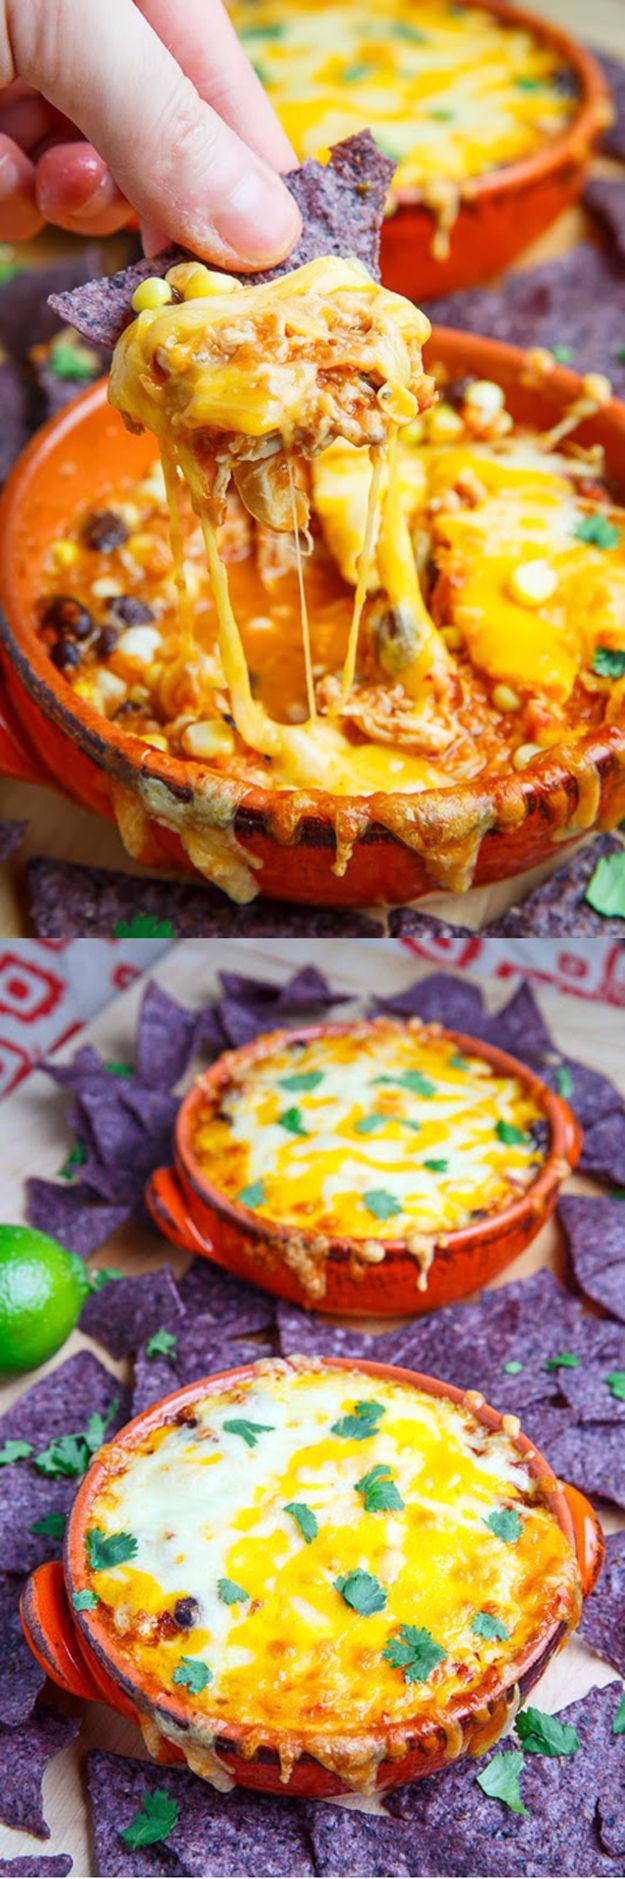 Cheesy Chicken Enchilada Dip Recipe | Cinco de Mayo Appetizer Recipes by DIY Ready at http://diyready.com/23-cinco-de-mayo-recipes-to-get-the-party-started/